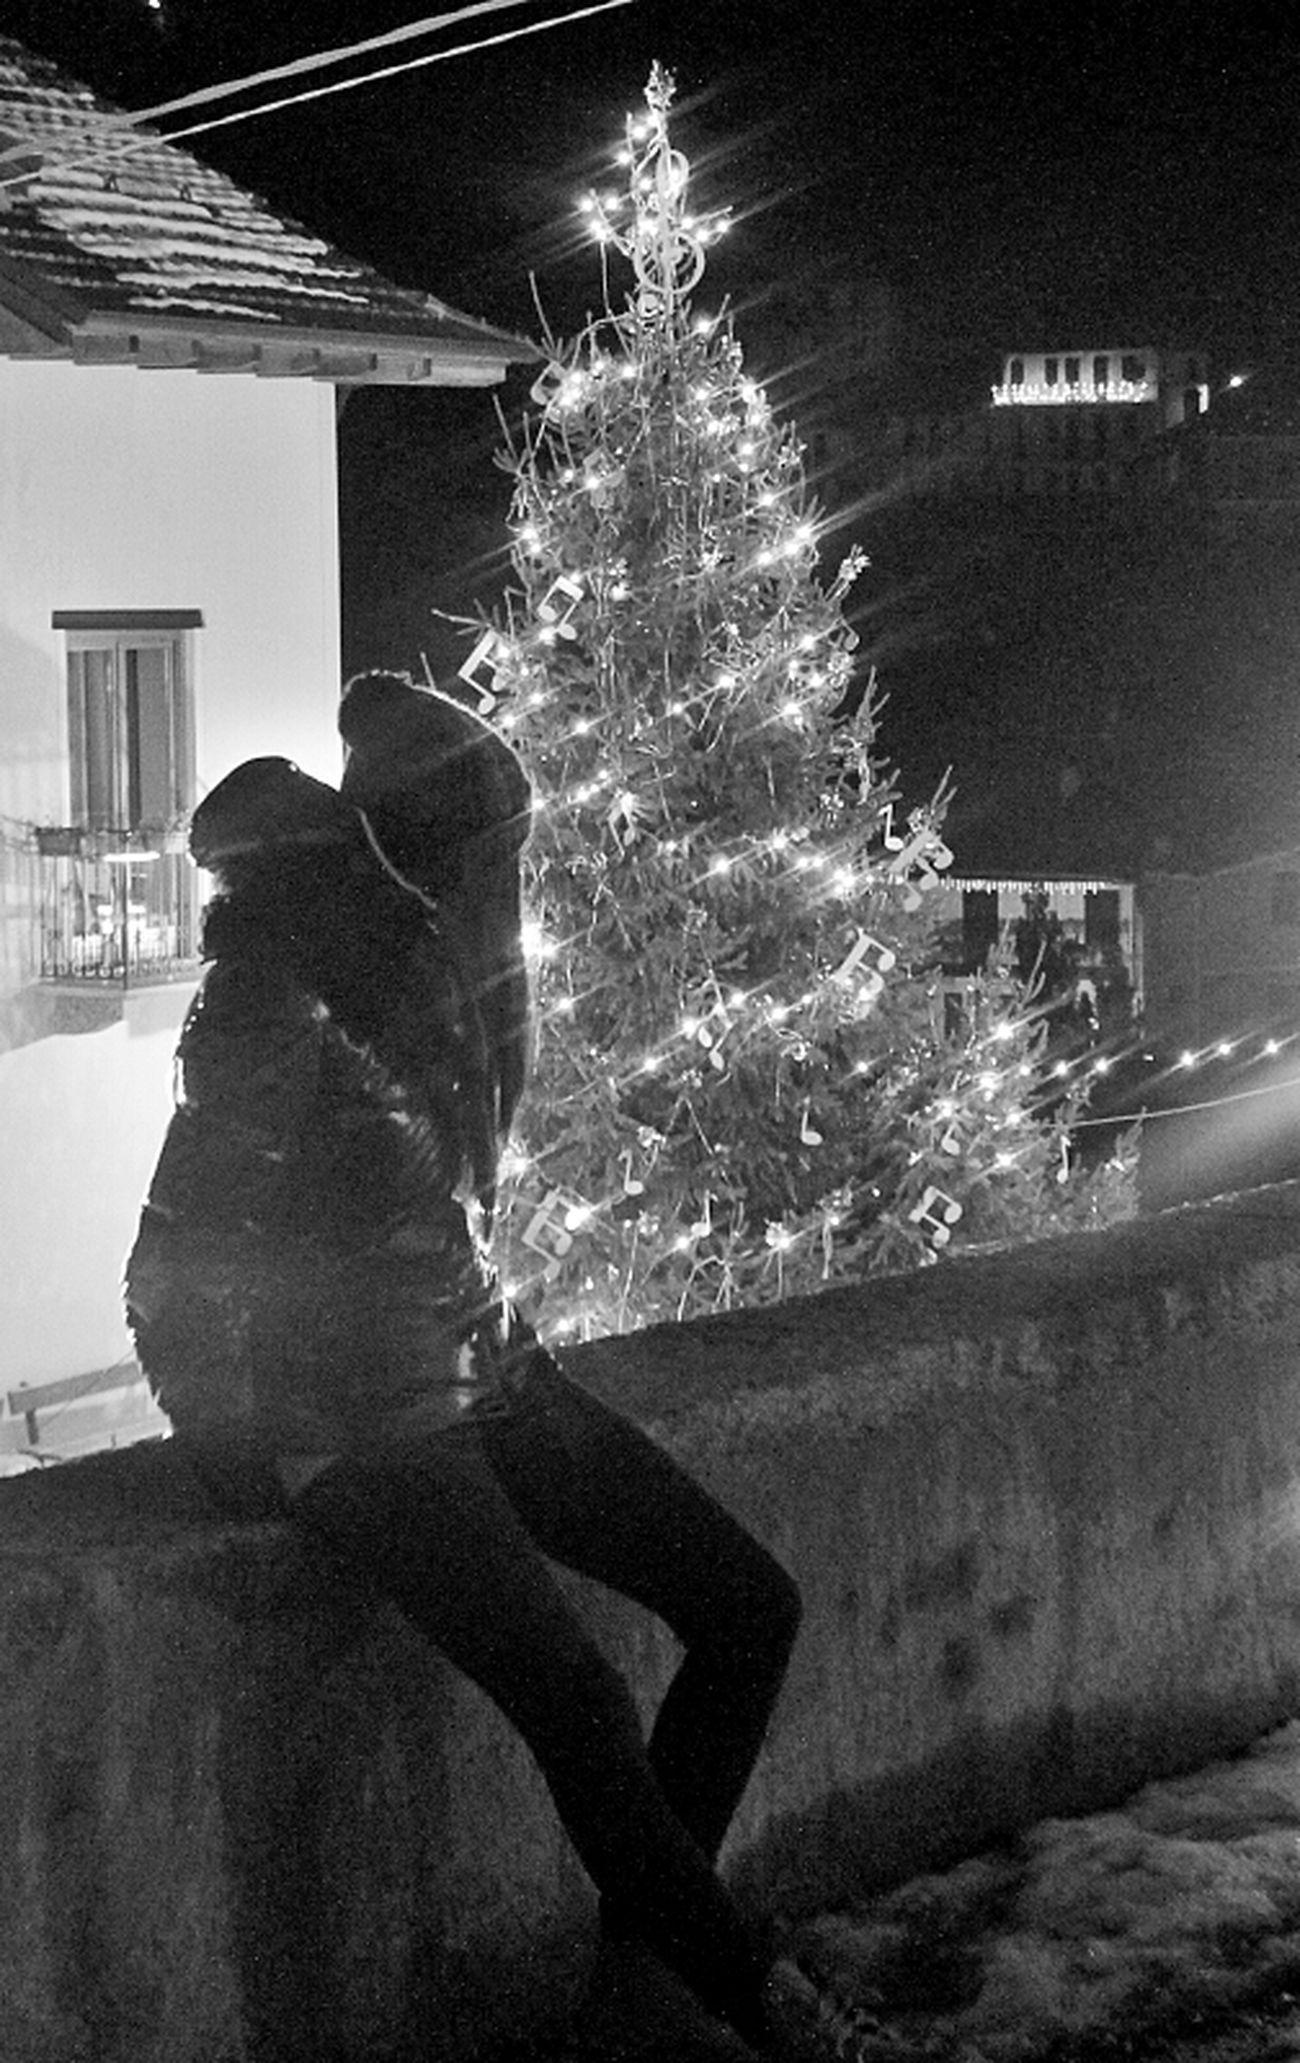 Streetphotography Blackandwhite Street Life Christmas Tree Streetphoto_bw Bws_worldwide